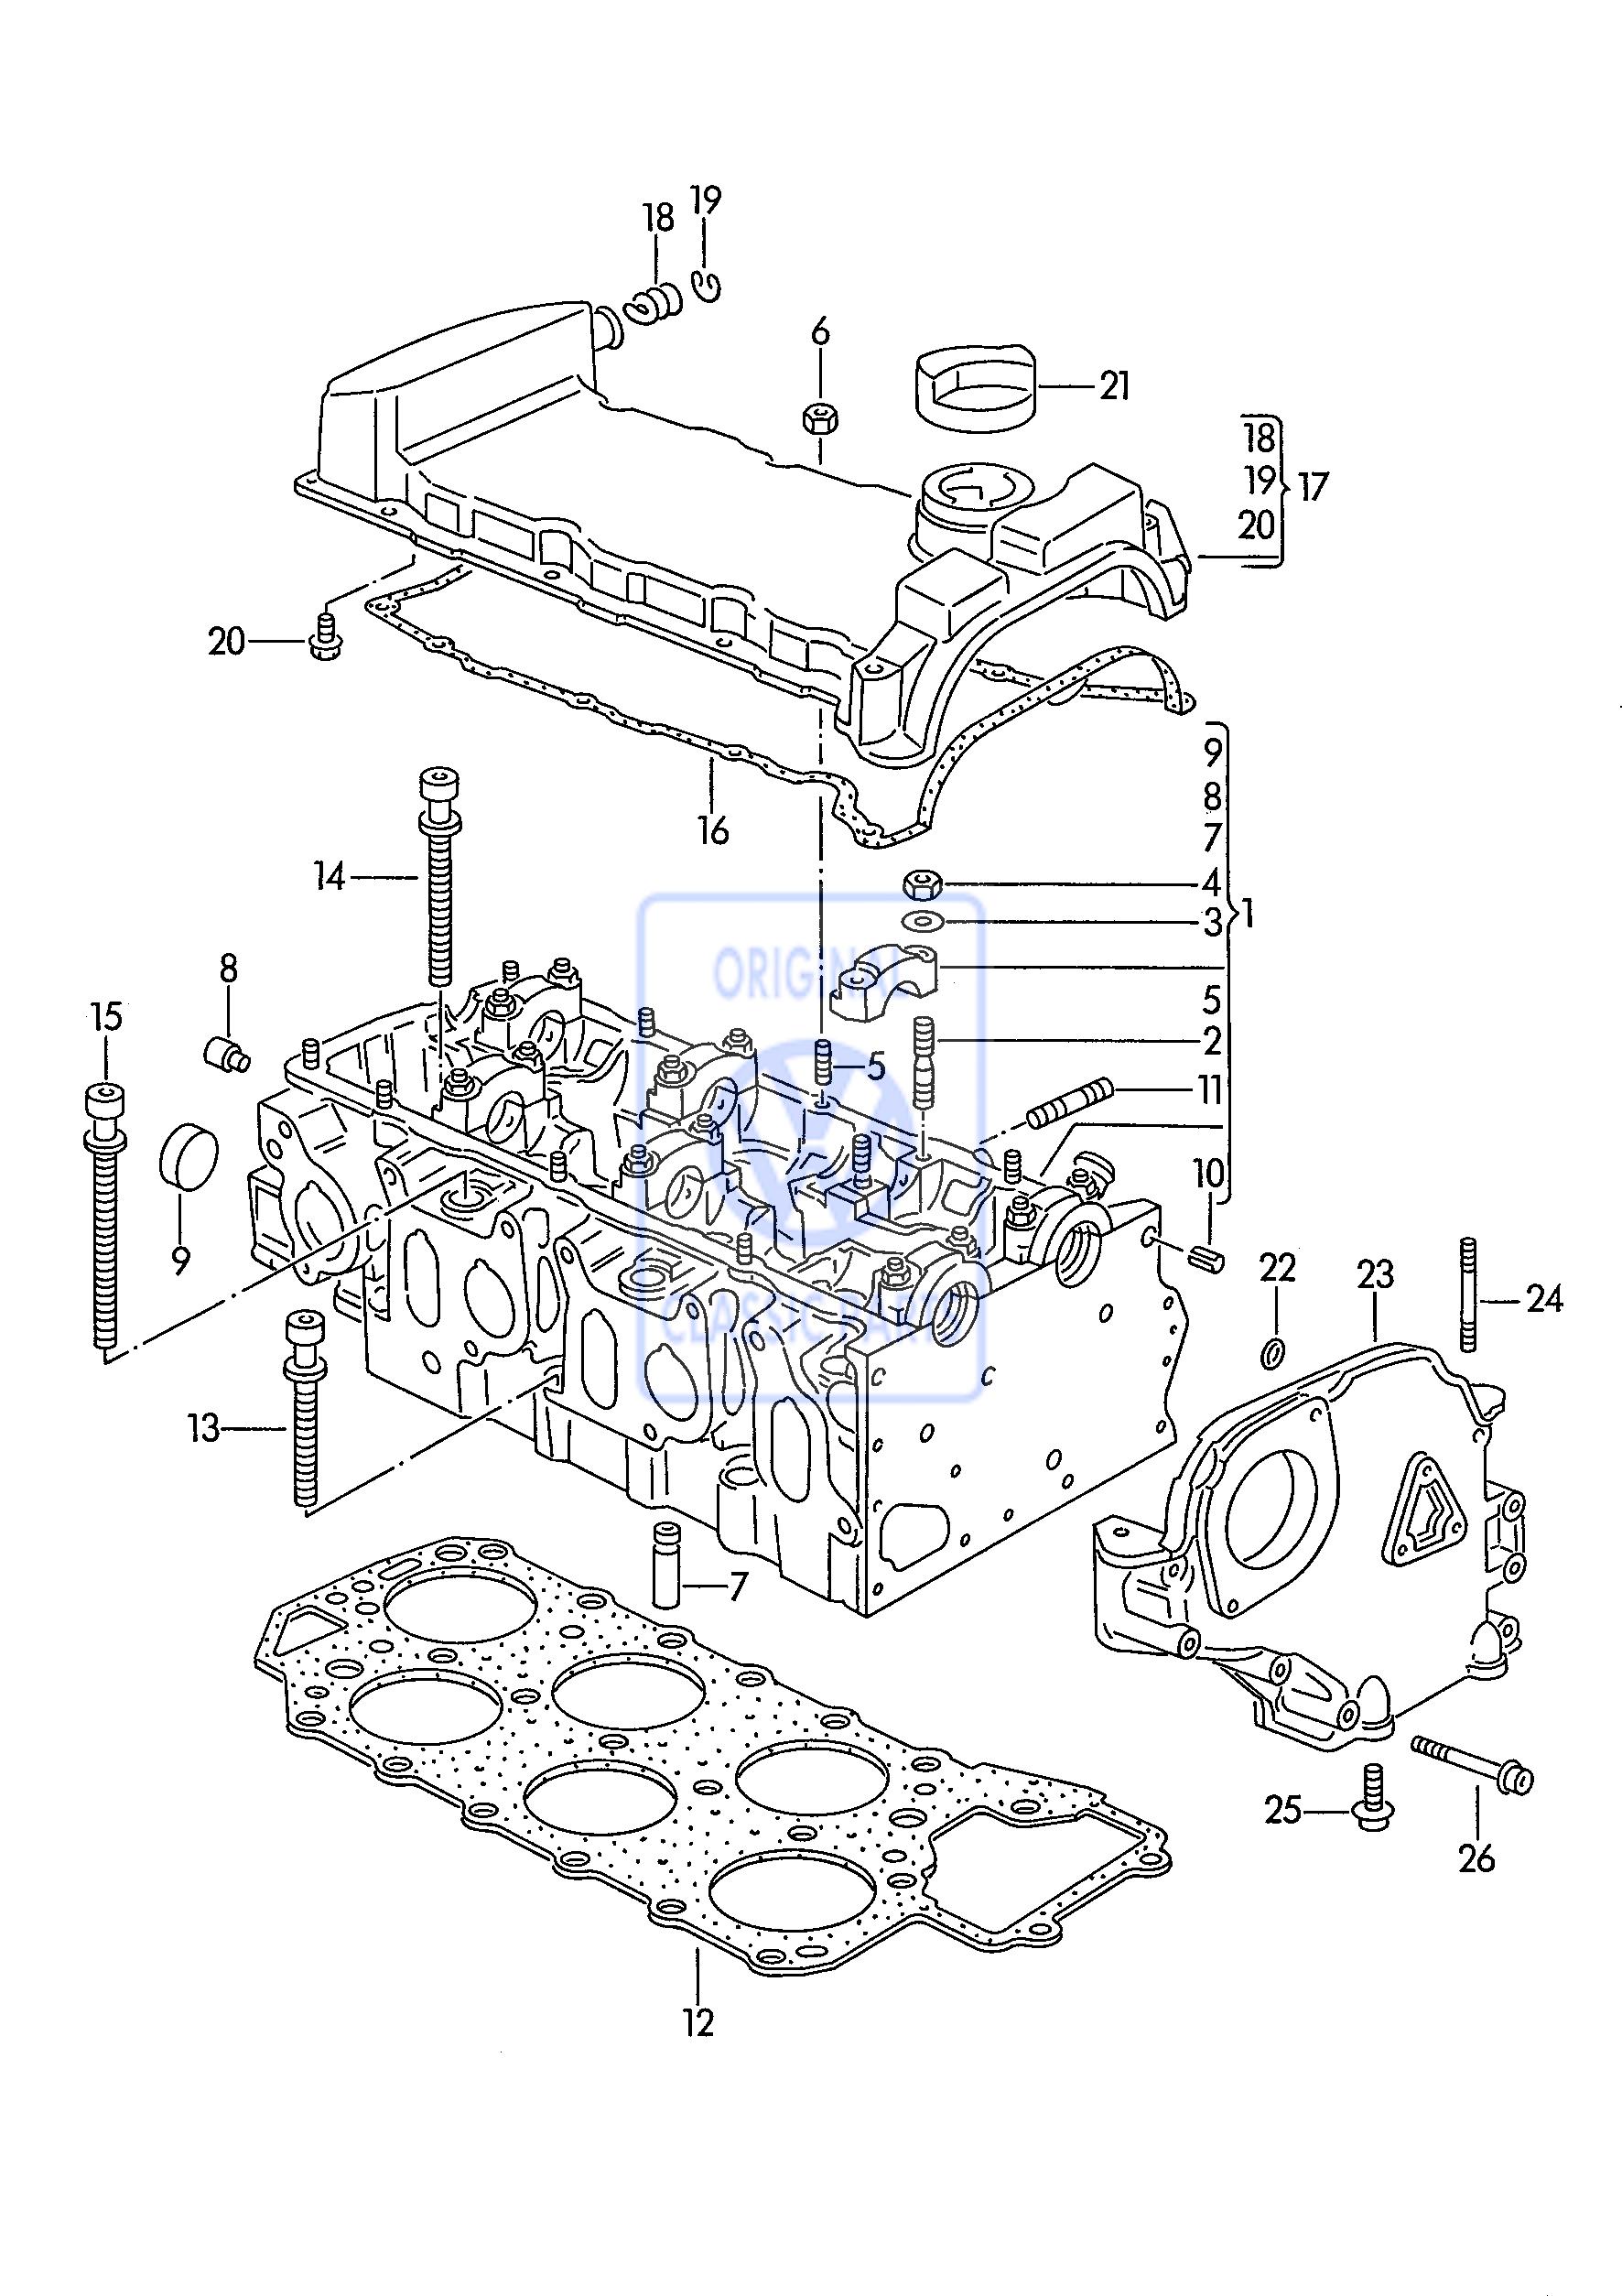 w12 engine diagram 24v vr6 engine diagram wiring diagram schematics  24v vr6 engine diagram wiring diagram